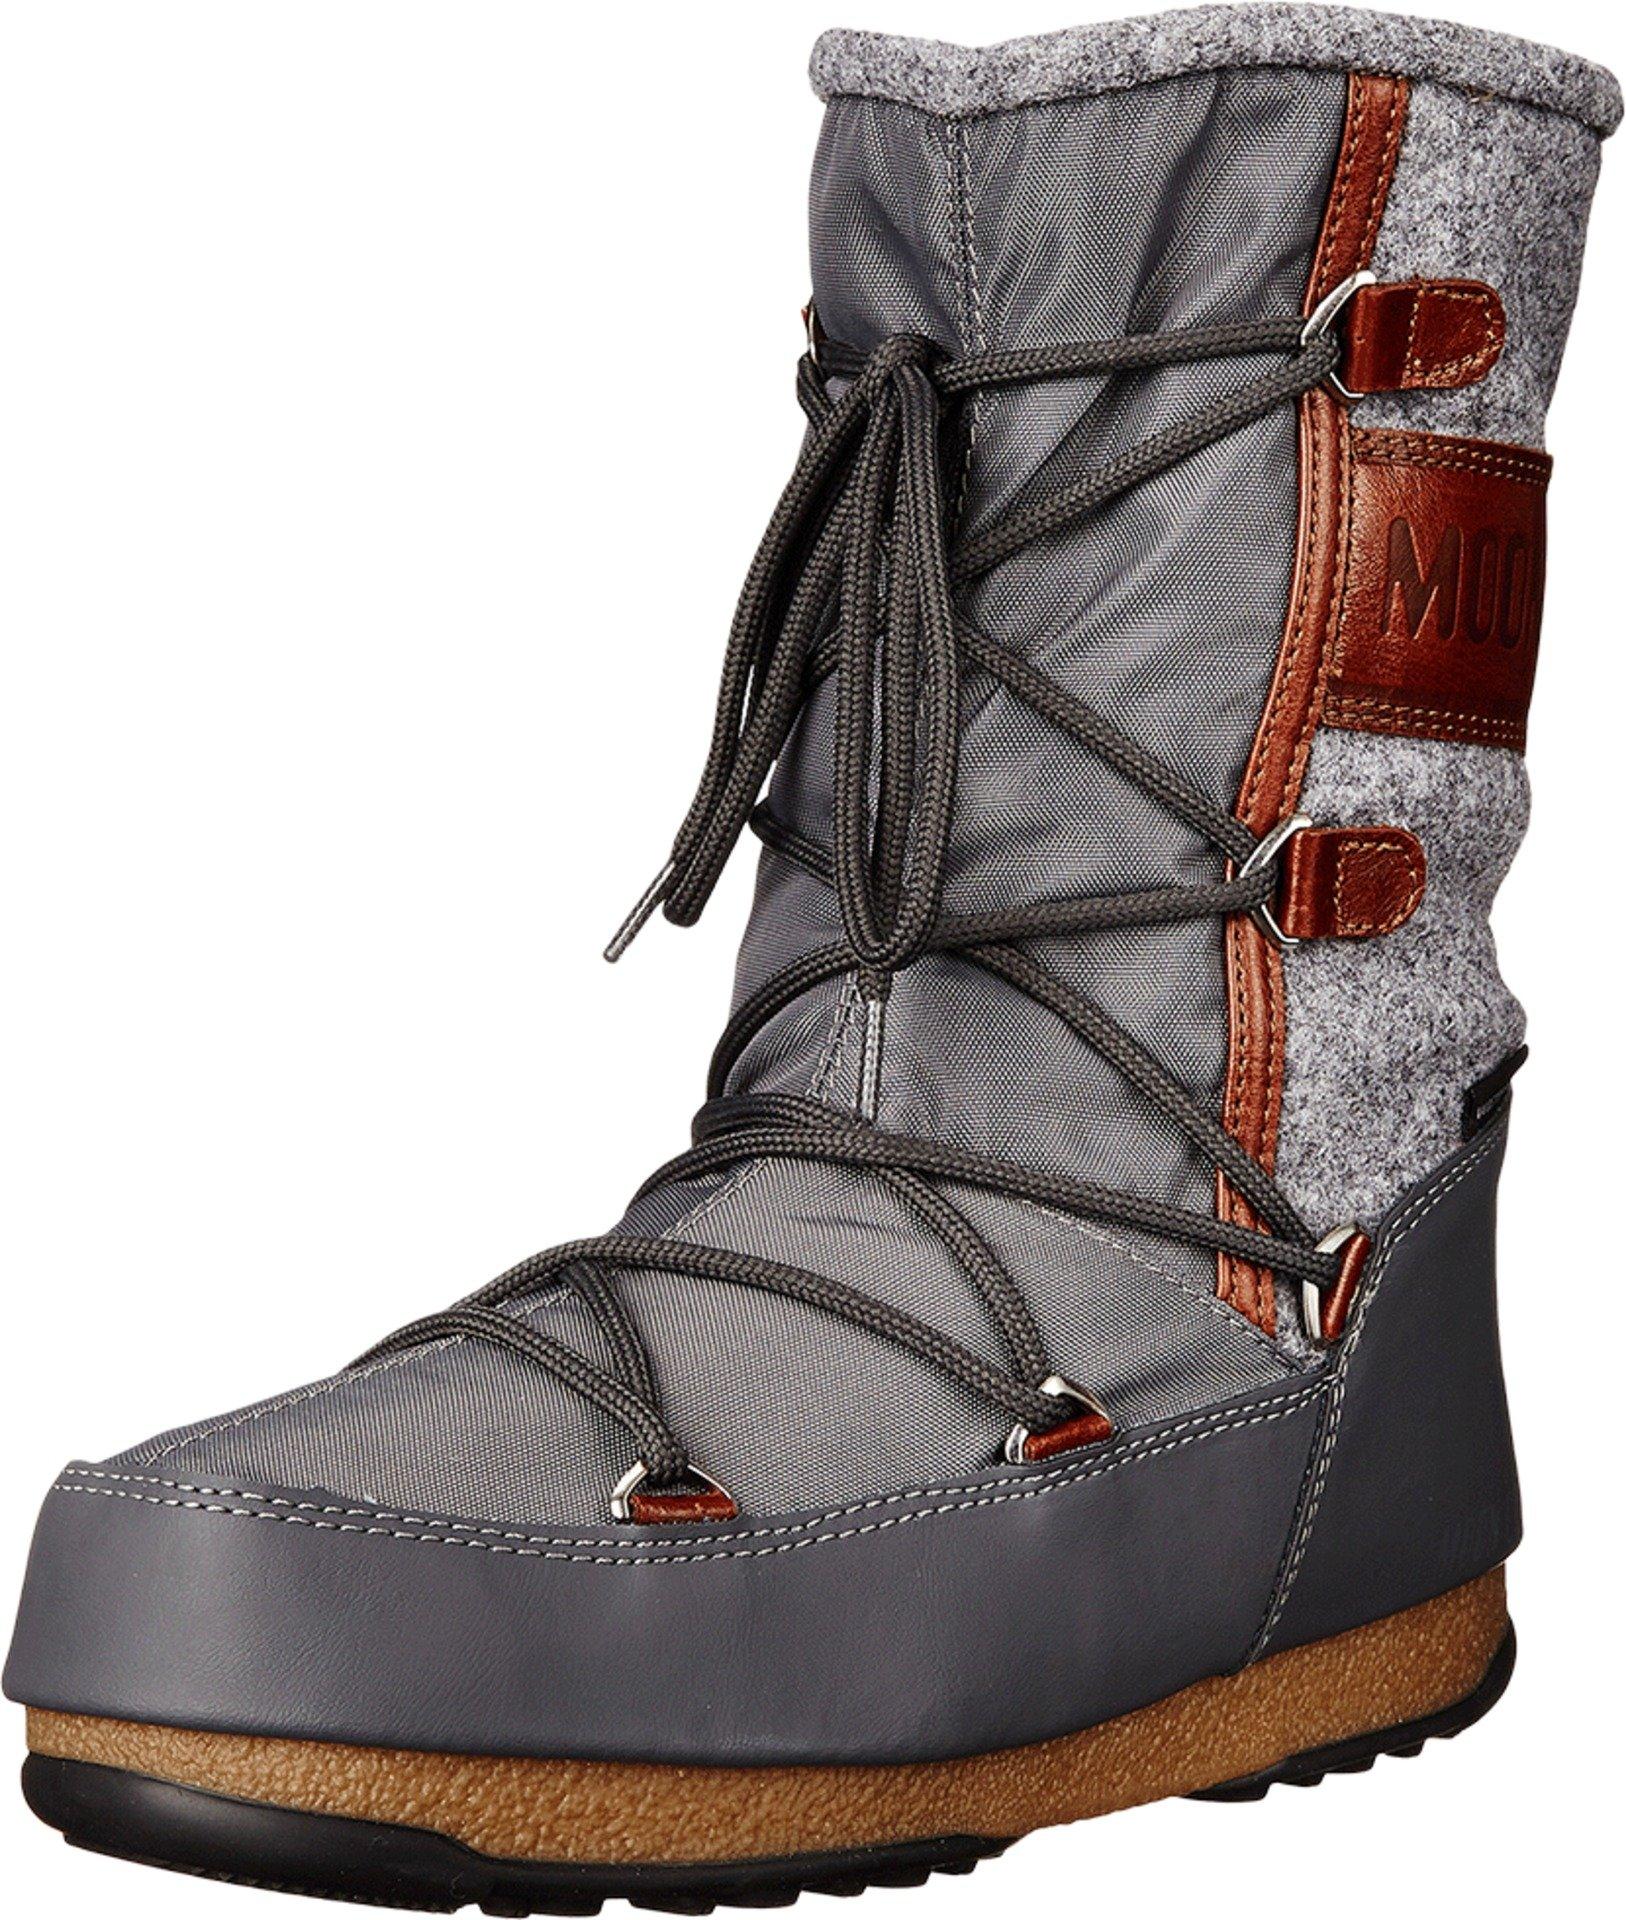 Tecnica Women's Moon W.E. Vienna Felt Winter Fashion Boot, Gray, 40 EU/8.5 M US